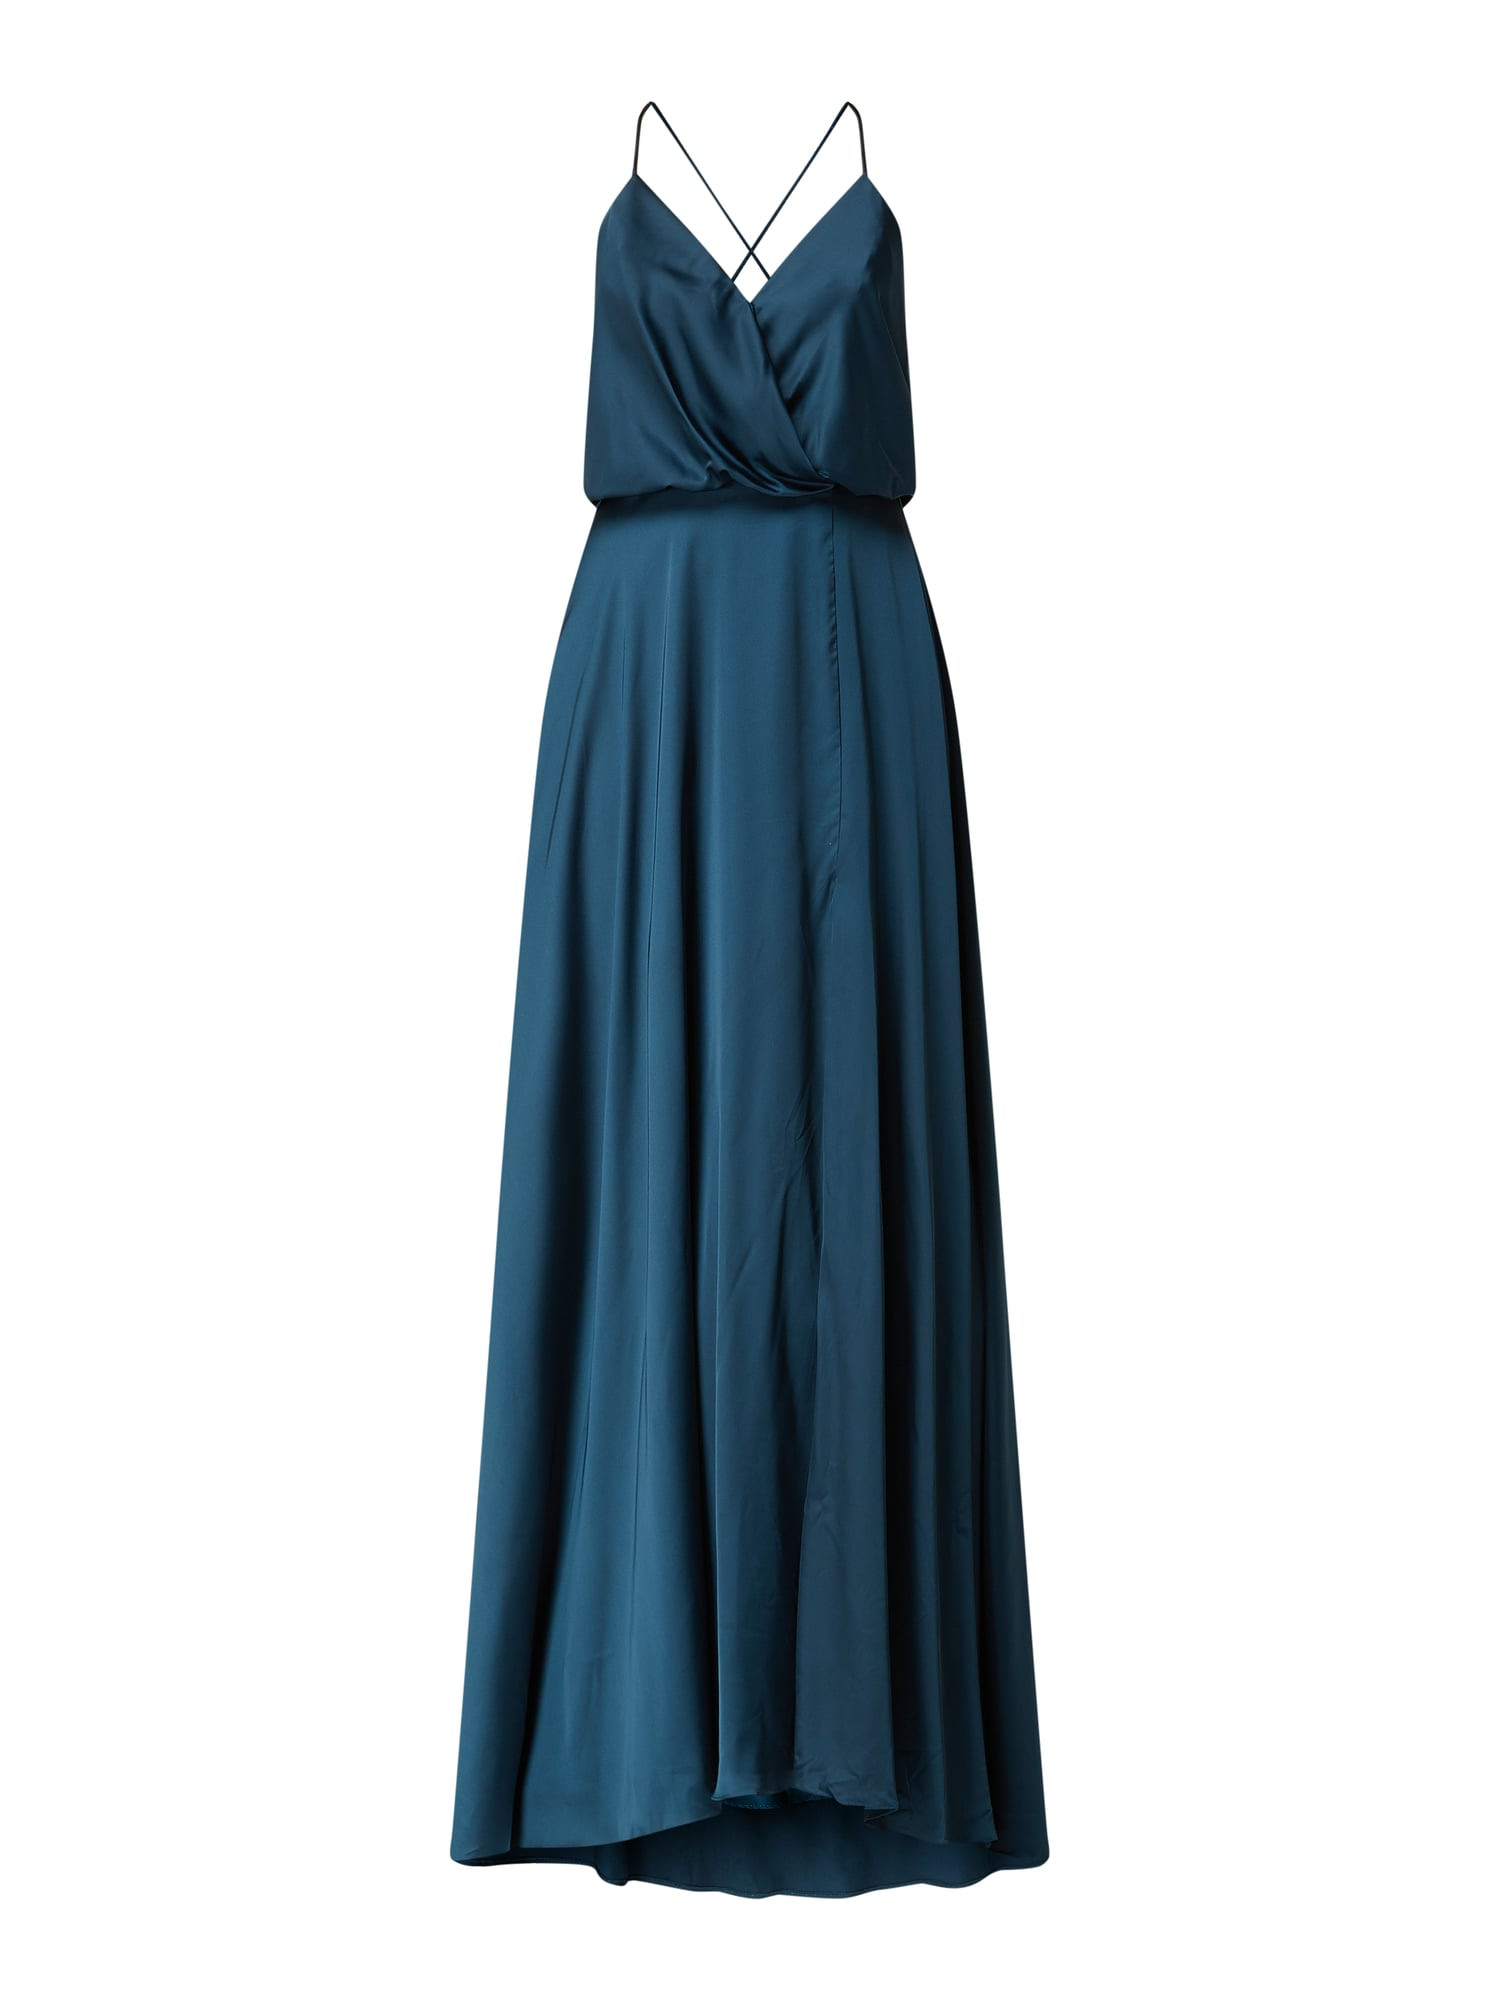 Abend Genial Unique Abendkleid Blau Galerie10 Schön Unique Abendkleid Blau Bester Preis